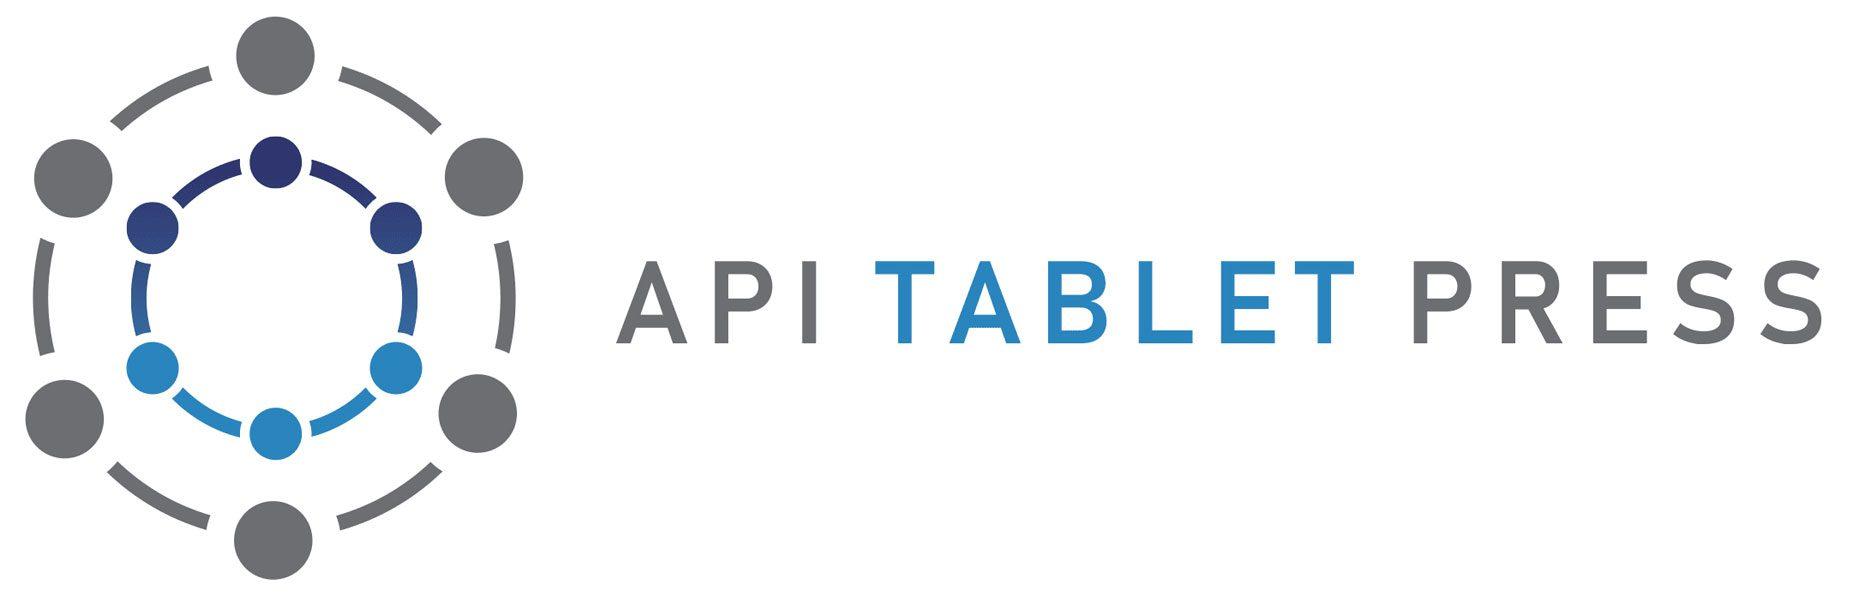 API Tablet Press